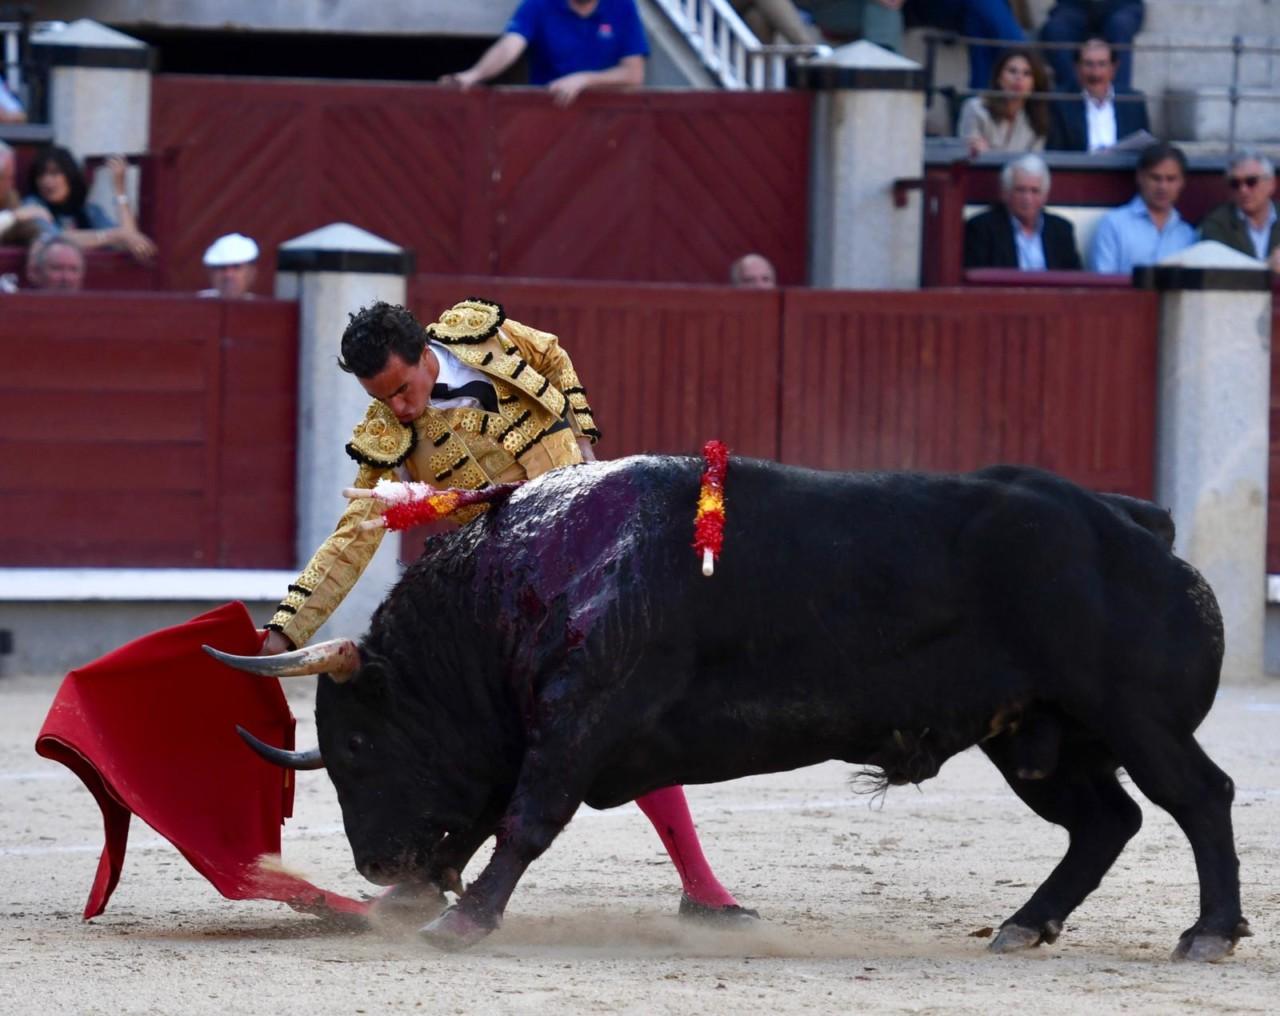 MADRID Se lidiaron toros de Valdefresno y Fraile Mazas (3º y 4º)